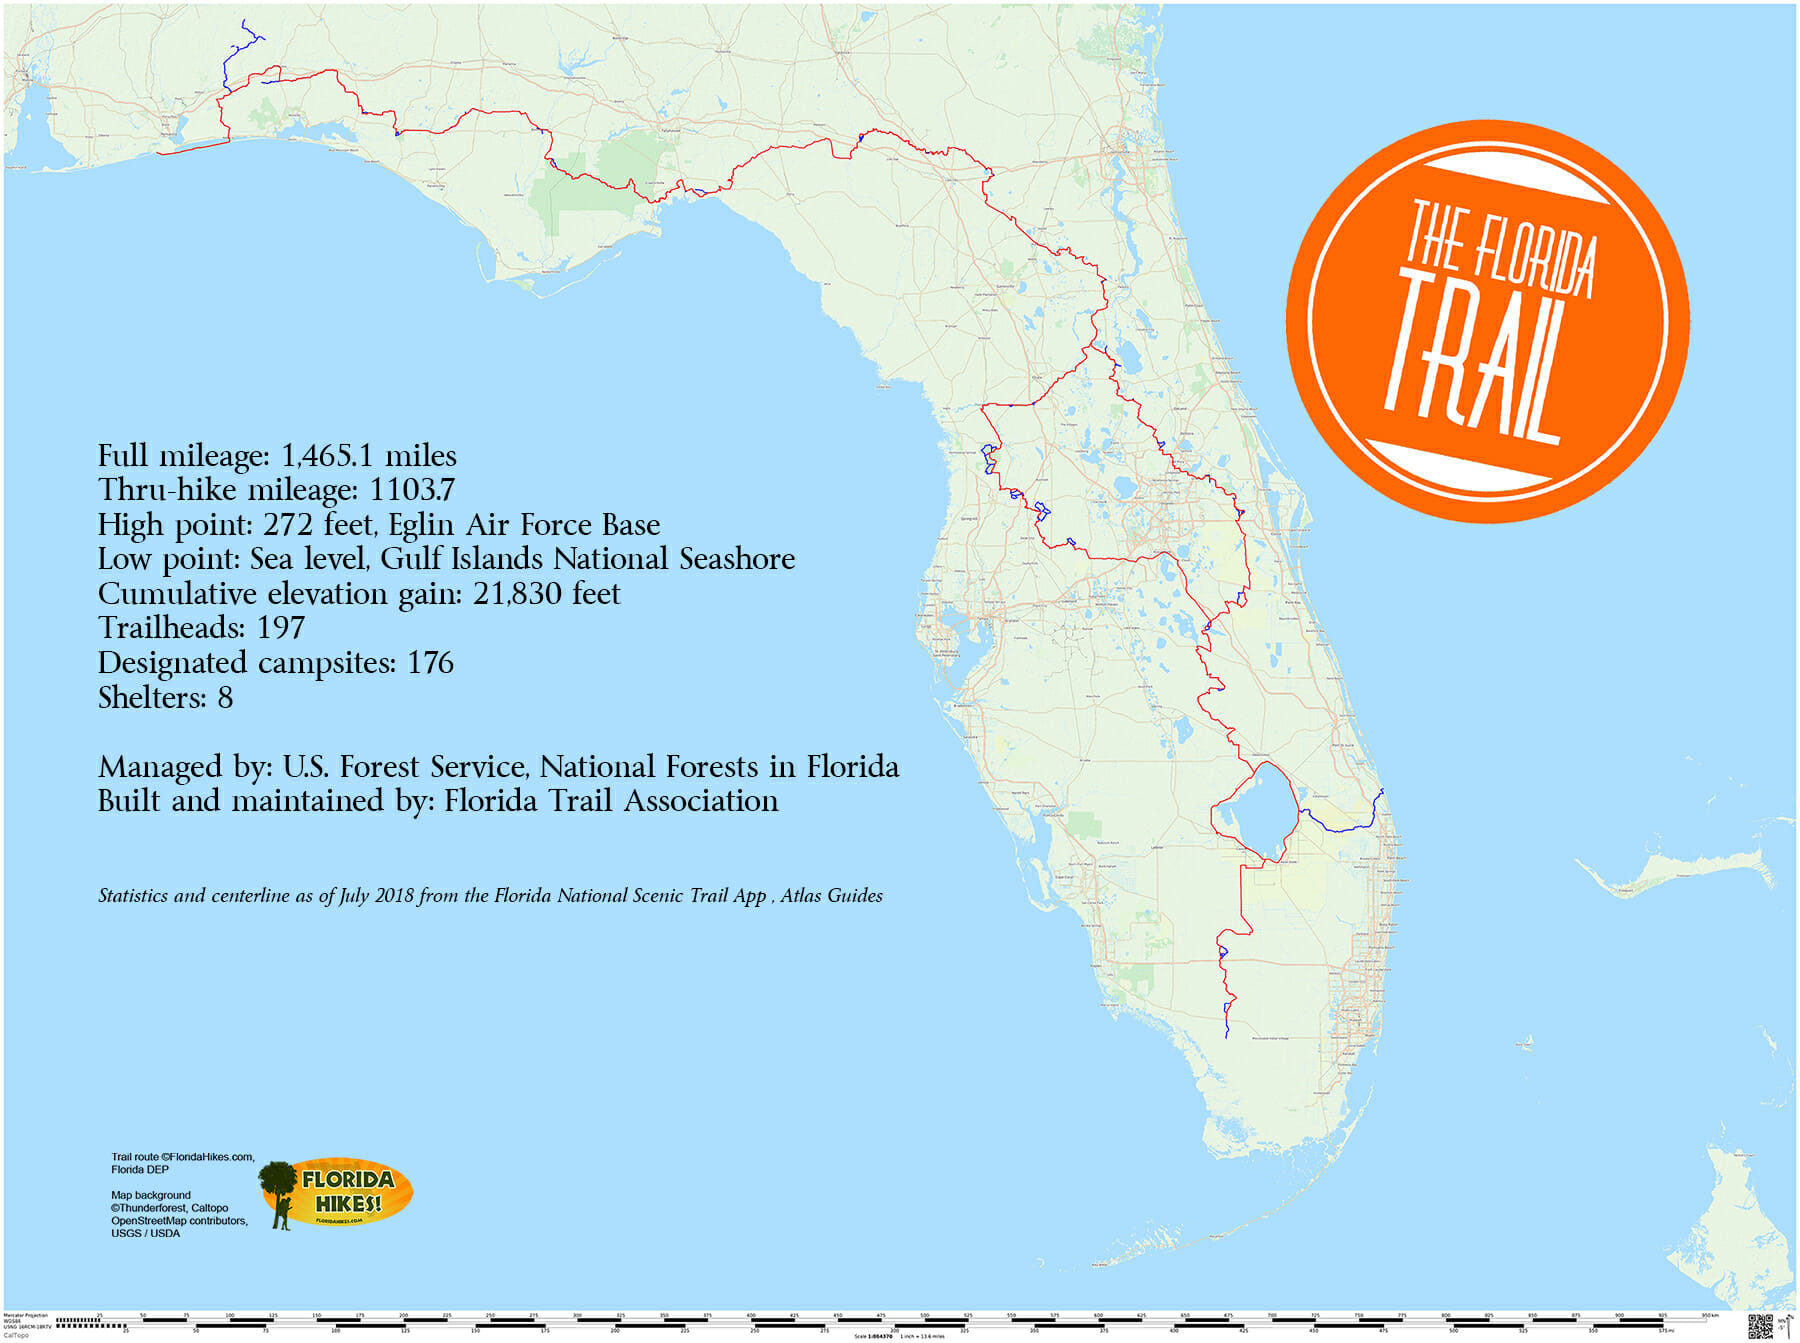 Florida Trail | Florida Hikes! - Florida Trail Association Maps